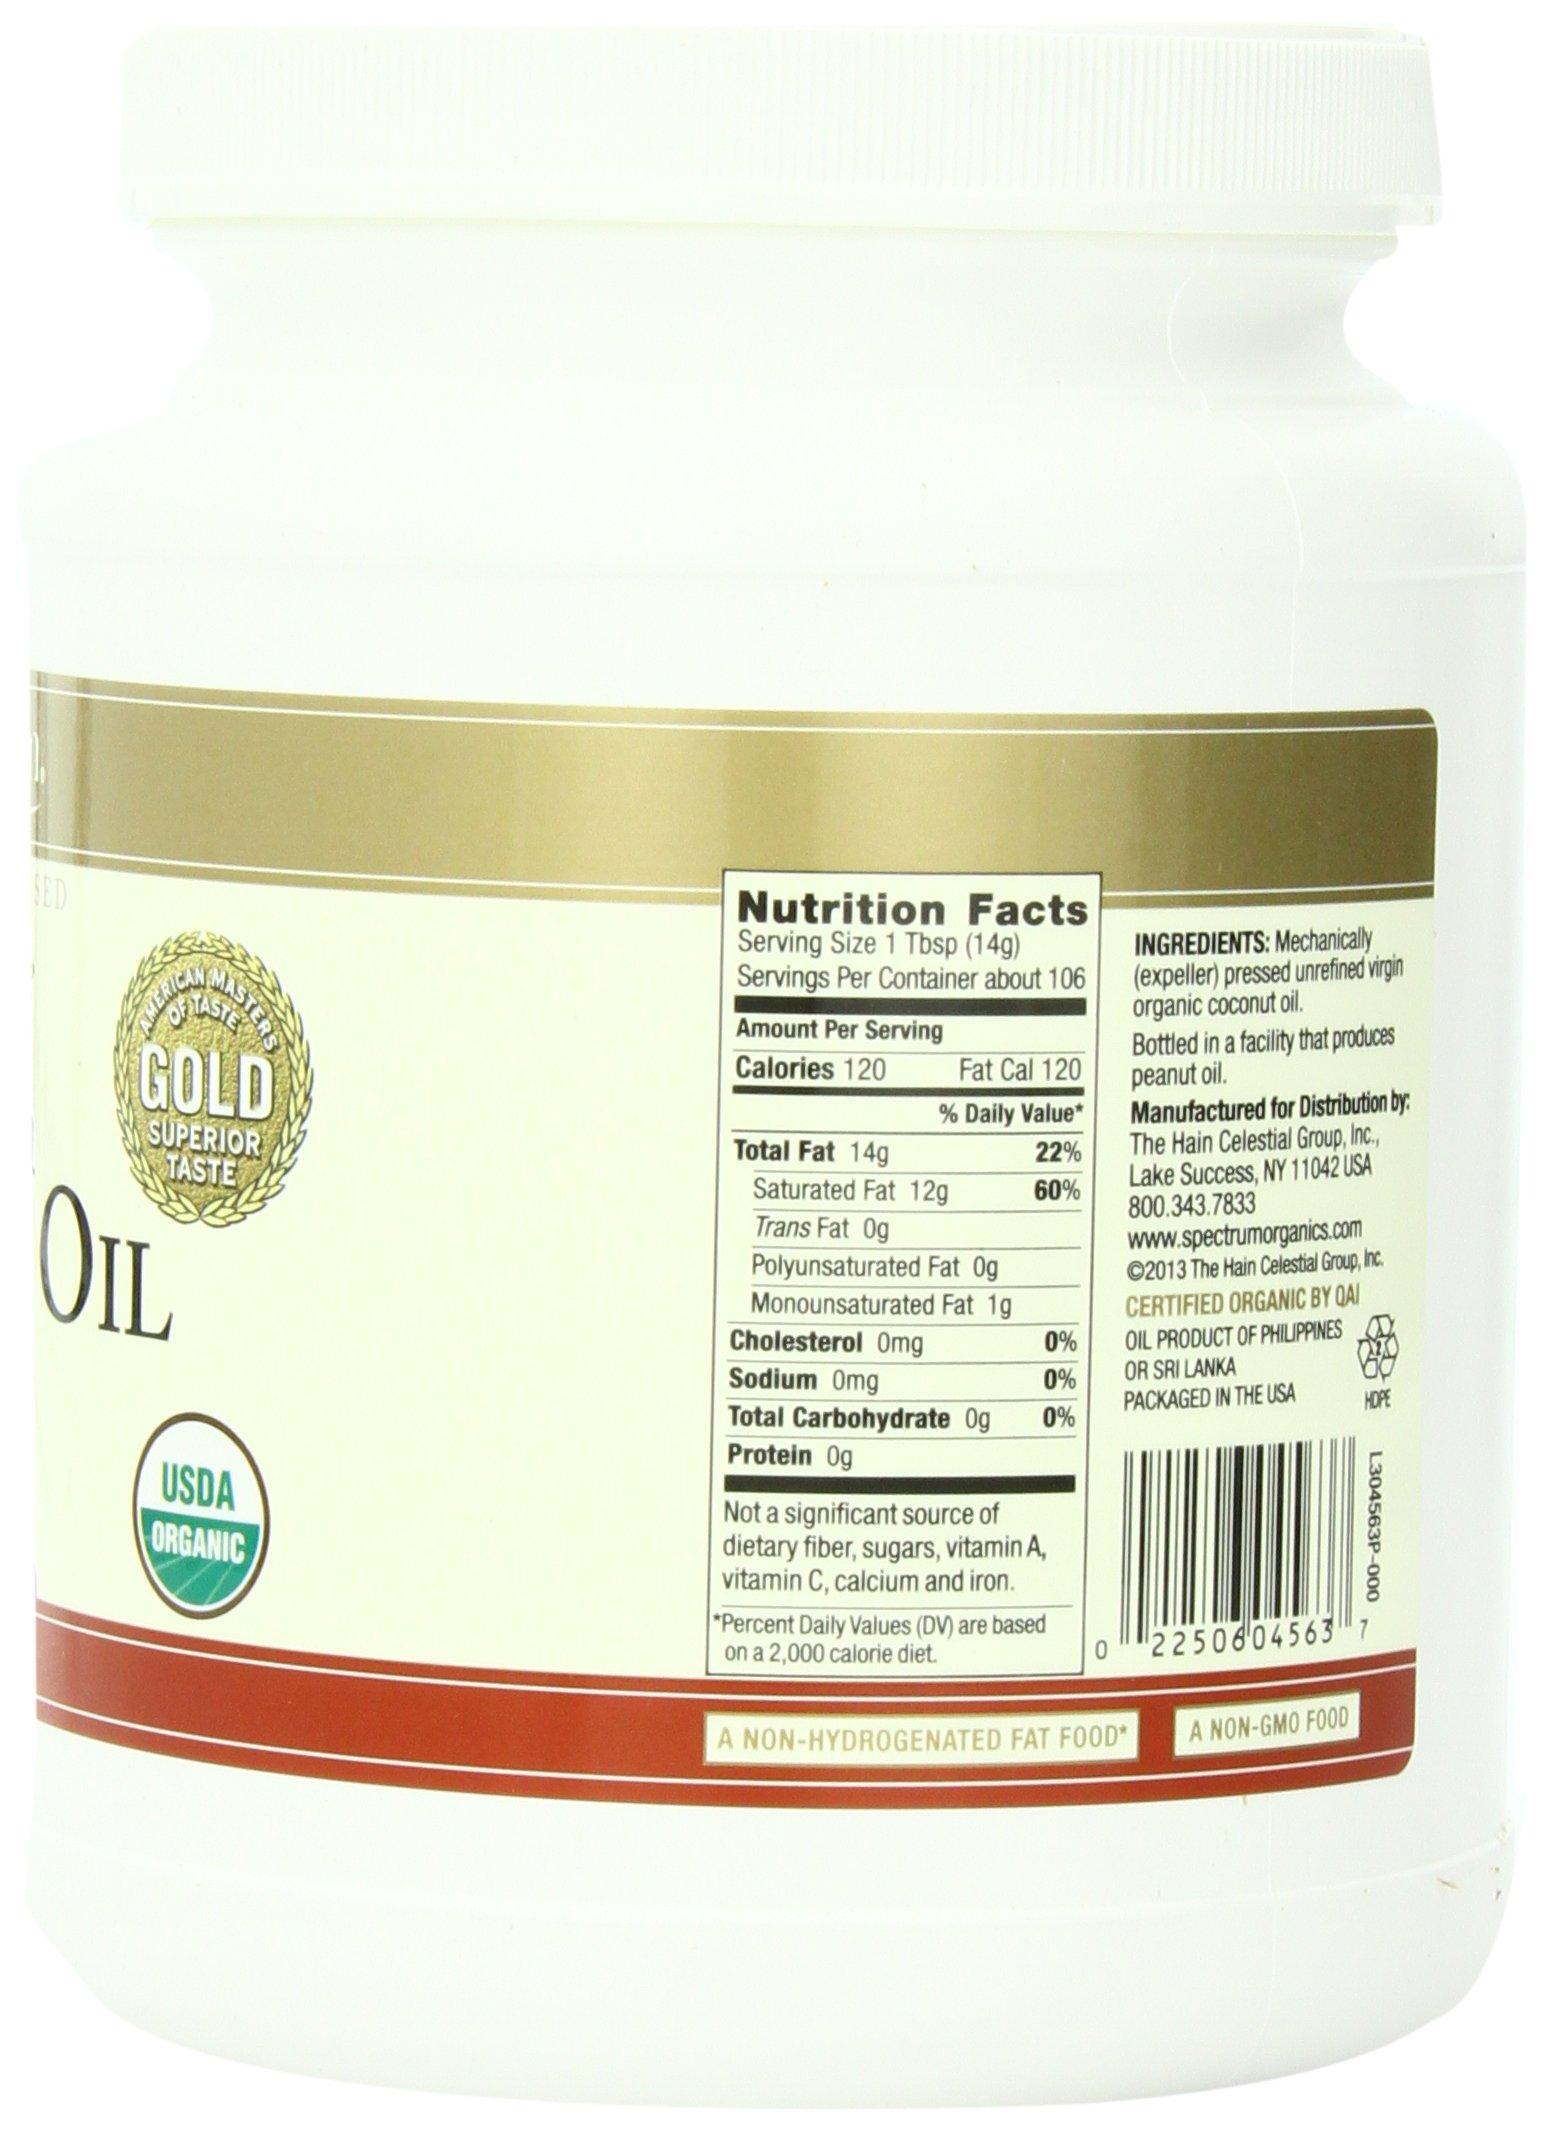 Spectrum Organic Coconut Oil for Cooking, Virgin, Unrefined, 54 fl. oz. by Spectrum (Image #6)